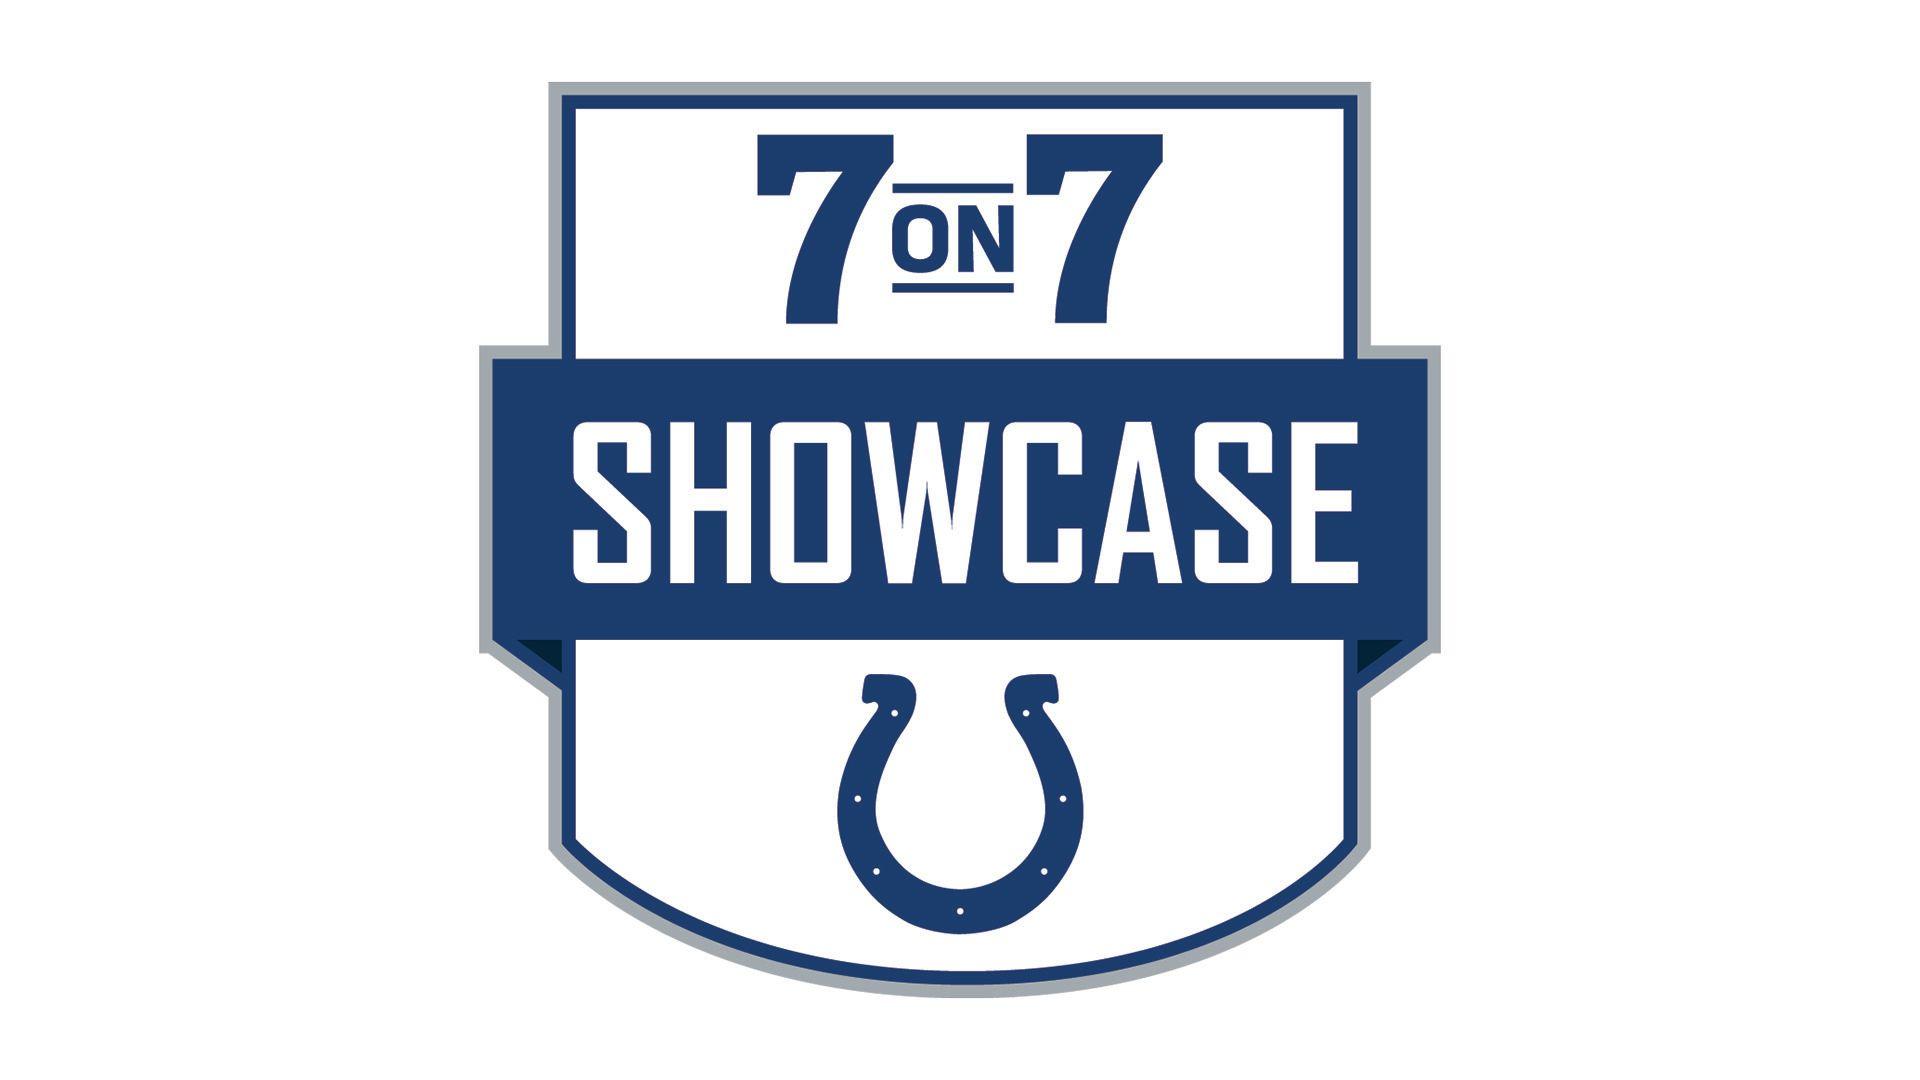 7-on-7 Showcase